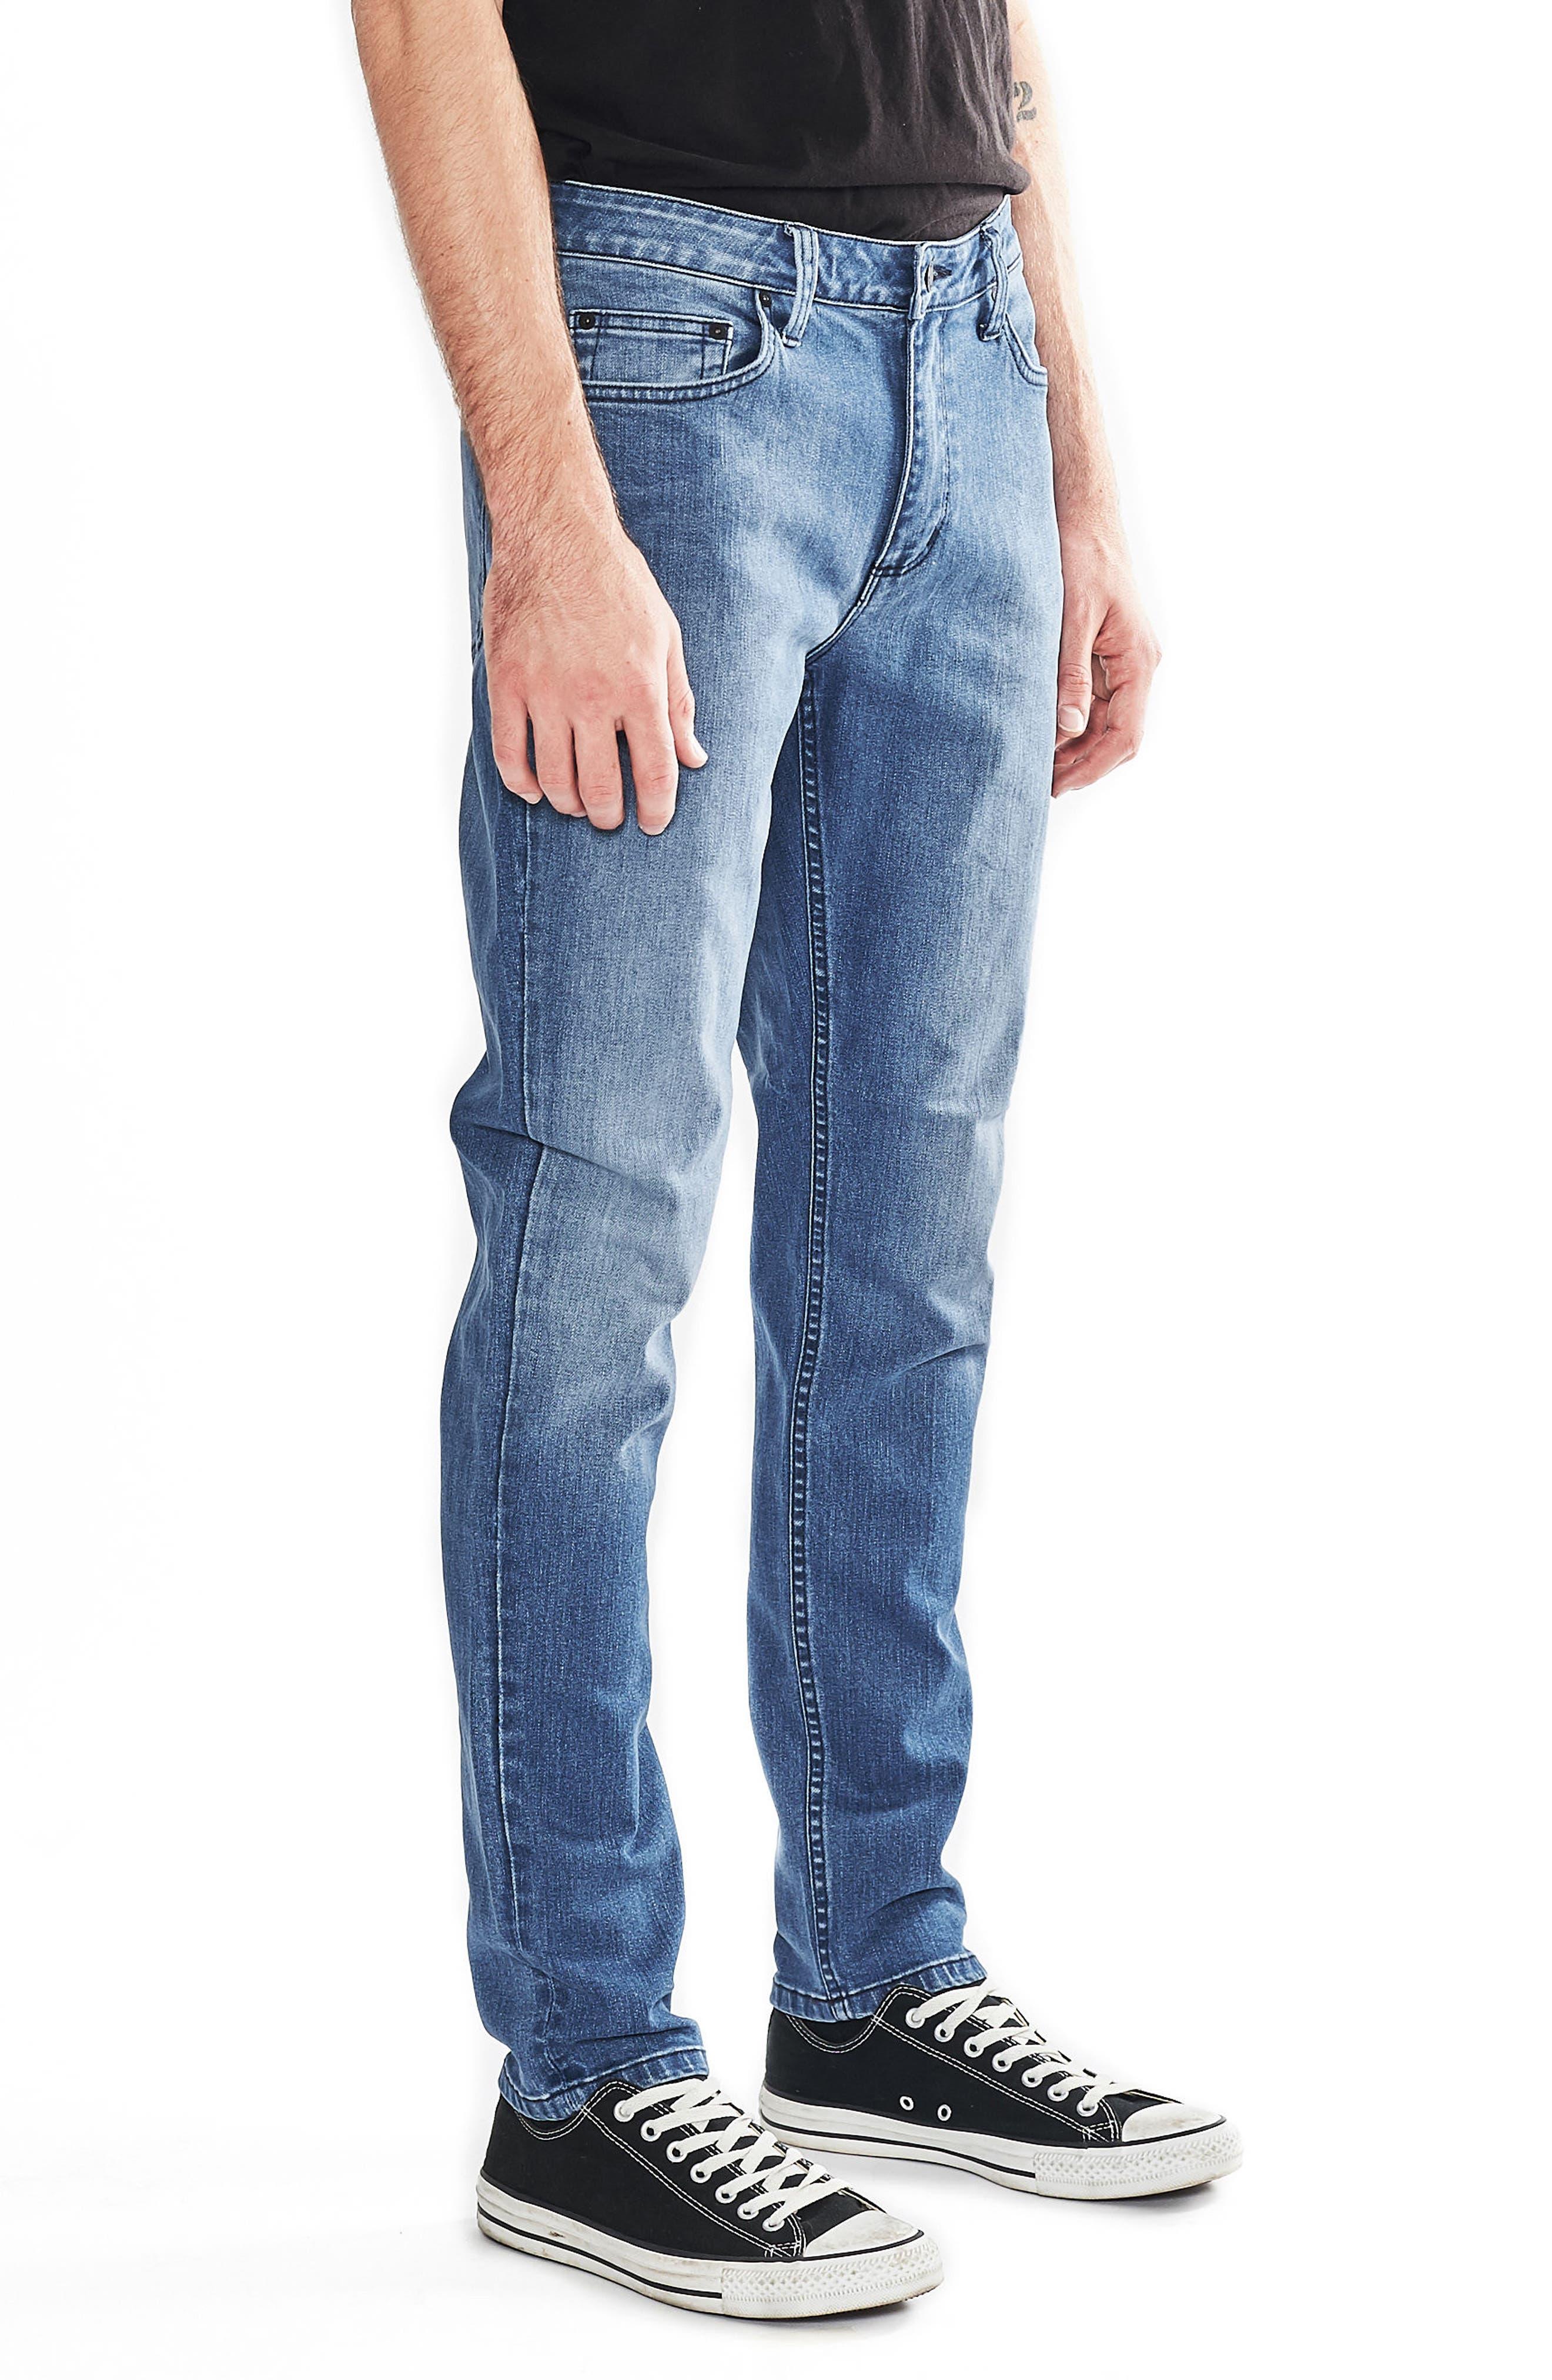 Tim Slims Slim Fit Jeans,                             Alternate thumbnail 4, color,                             Safety Beach Blue